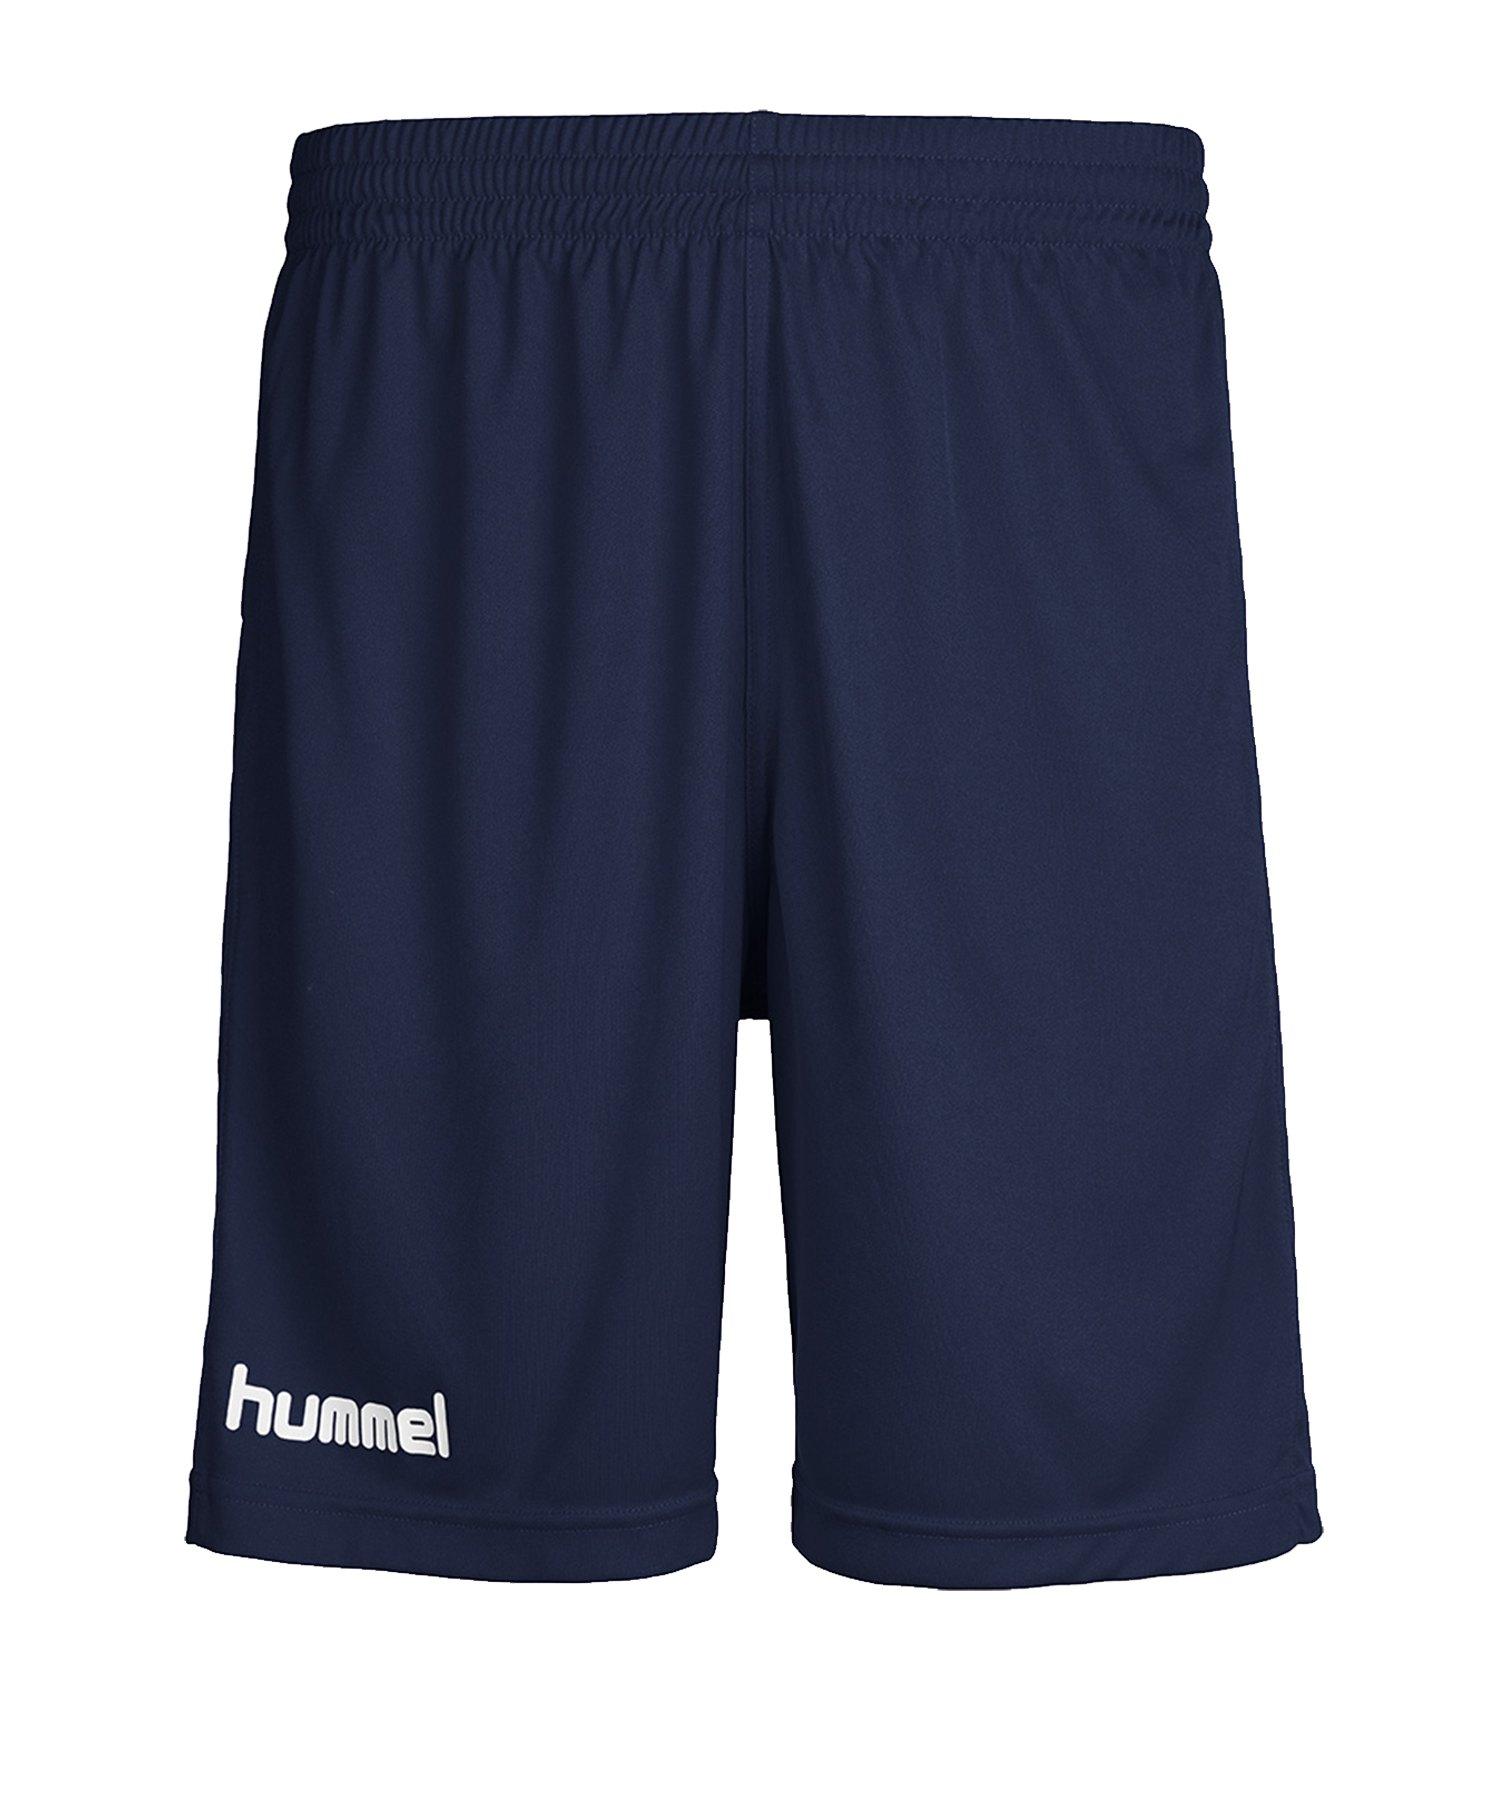 Hummel Core Short Dunkelblau F7027 - blau